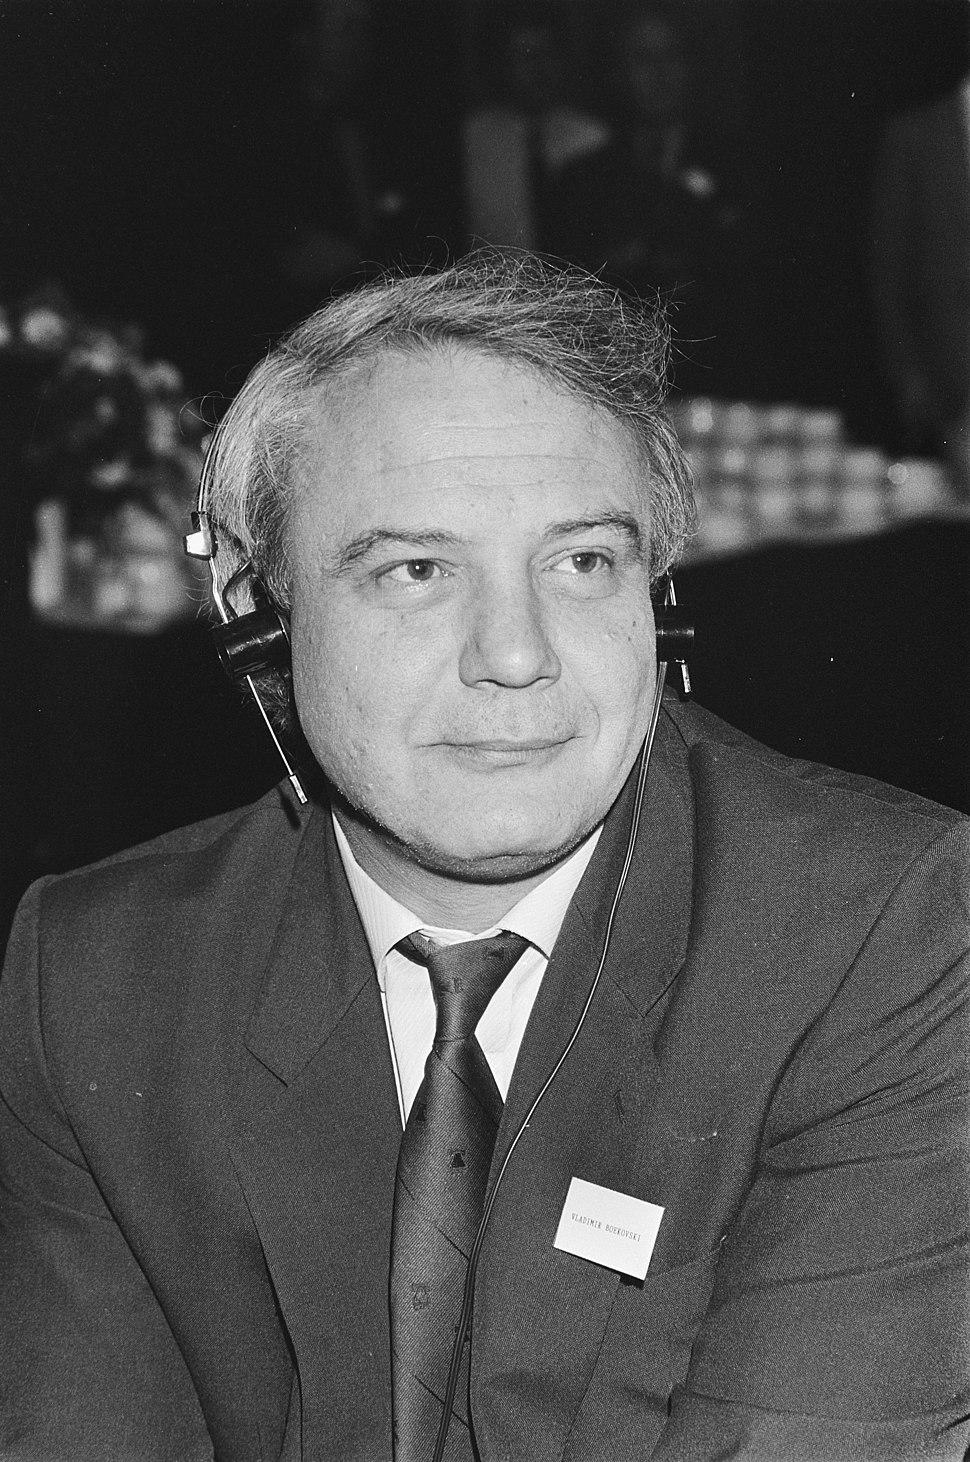 Boekovski1987